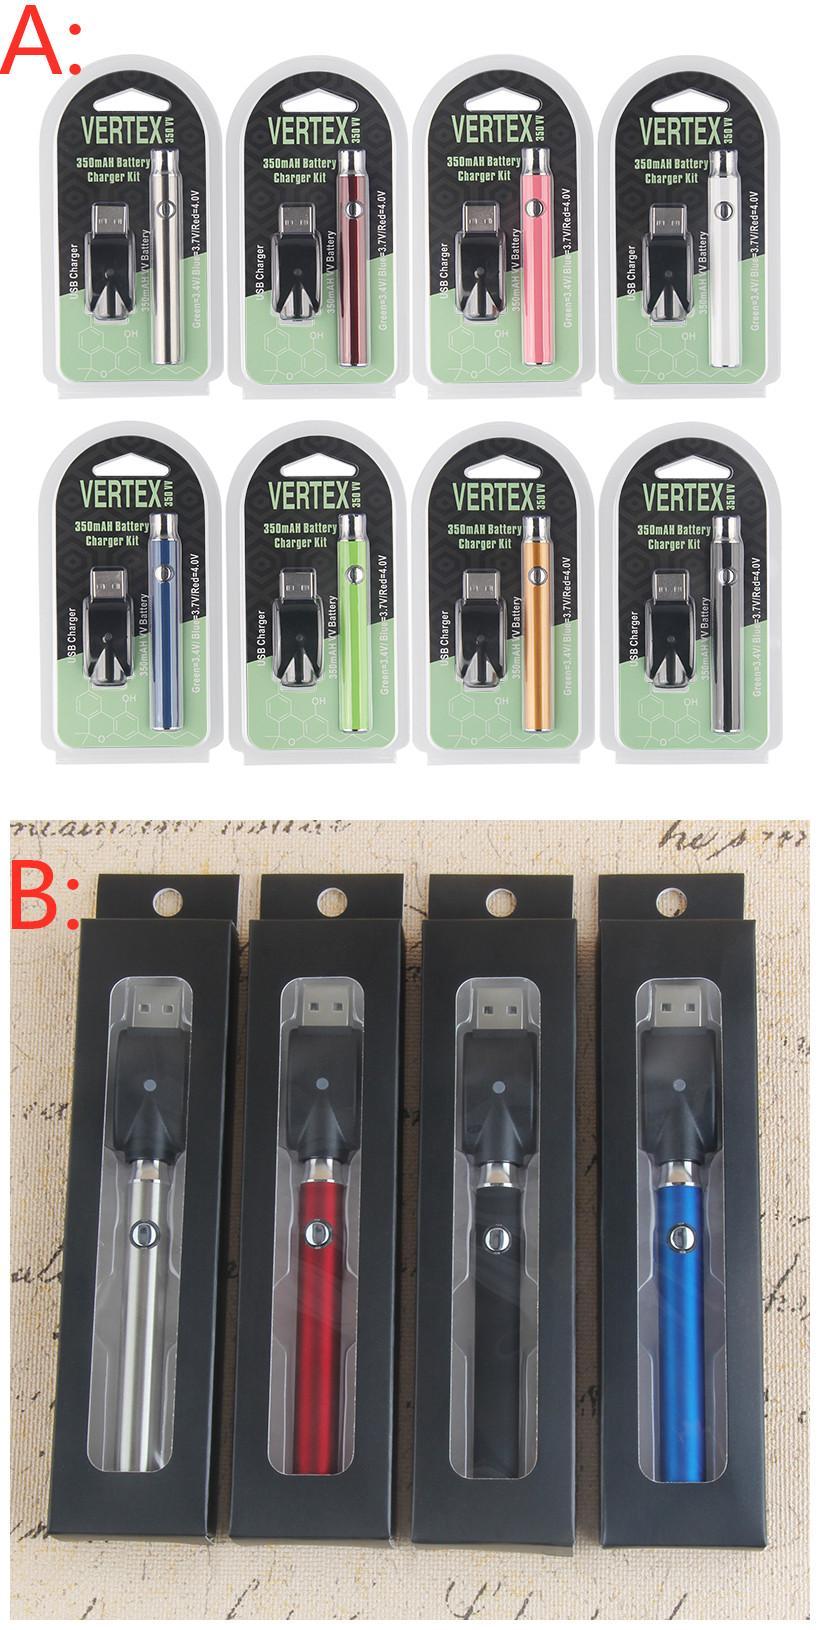 350mAh Precalentamiento de Vape Pens 510 Batería Ajustable Voltaje ECIG Vaping Vaporizador de precalentamiento Kit de cargador de batería Botón 3 TEMP AJUSTE VAPES